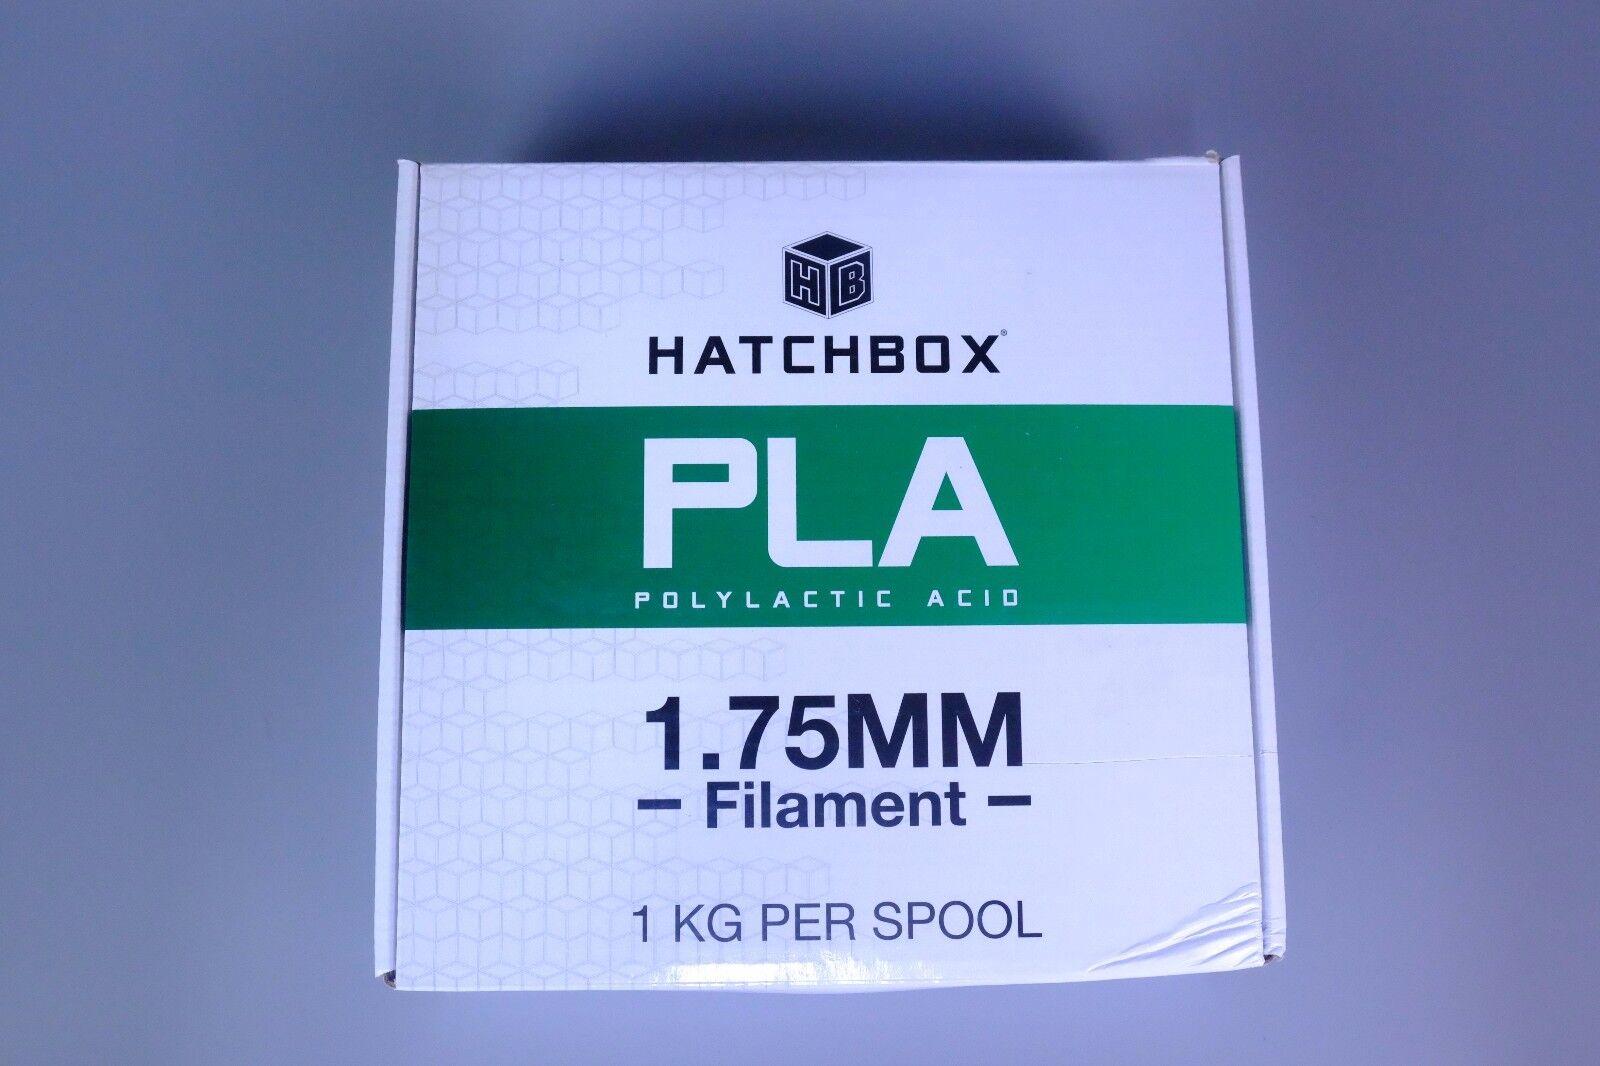 1 kg Spool 1.75 mm HATCHBOX Performance PLA 3D Printer Filament Green 3D PPLA-1KG1.75-GRN Dimensional Accuracy +//- 0.03 mm